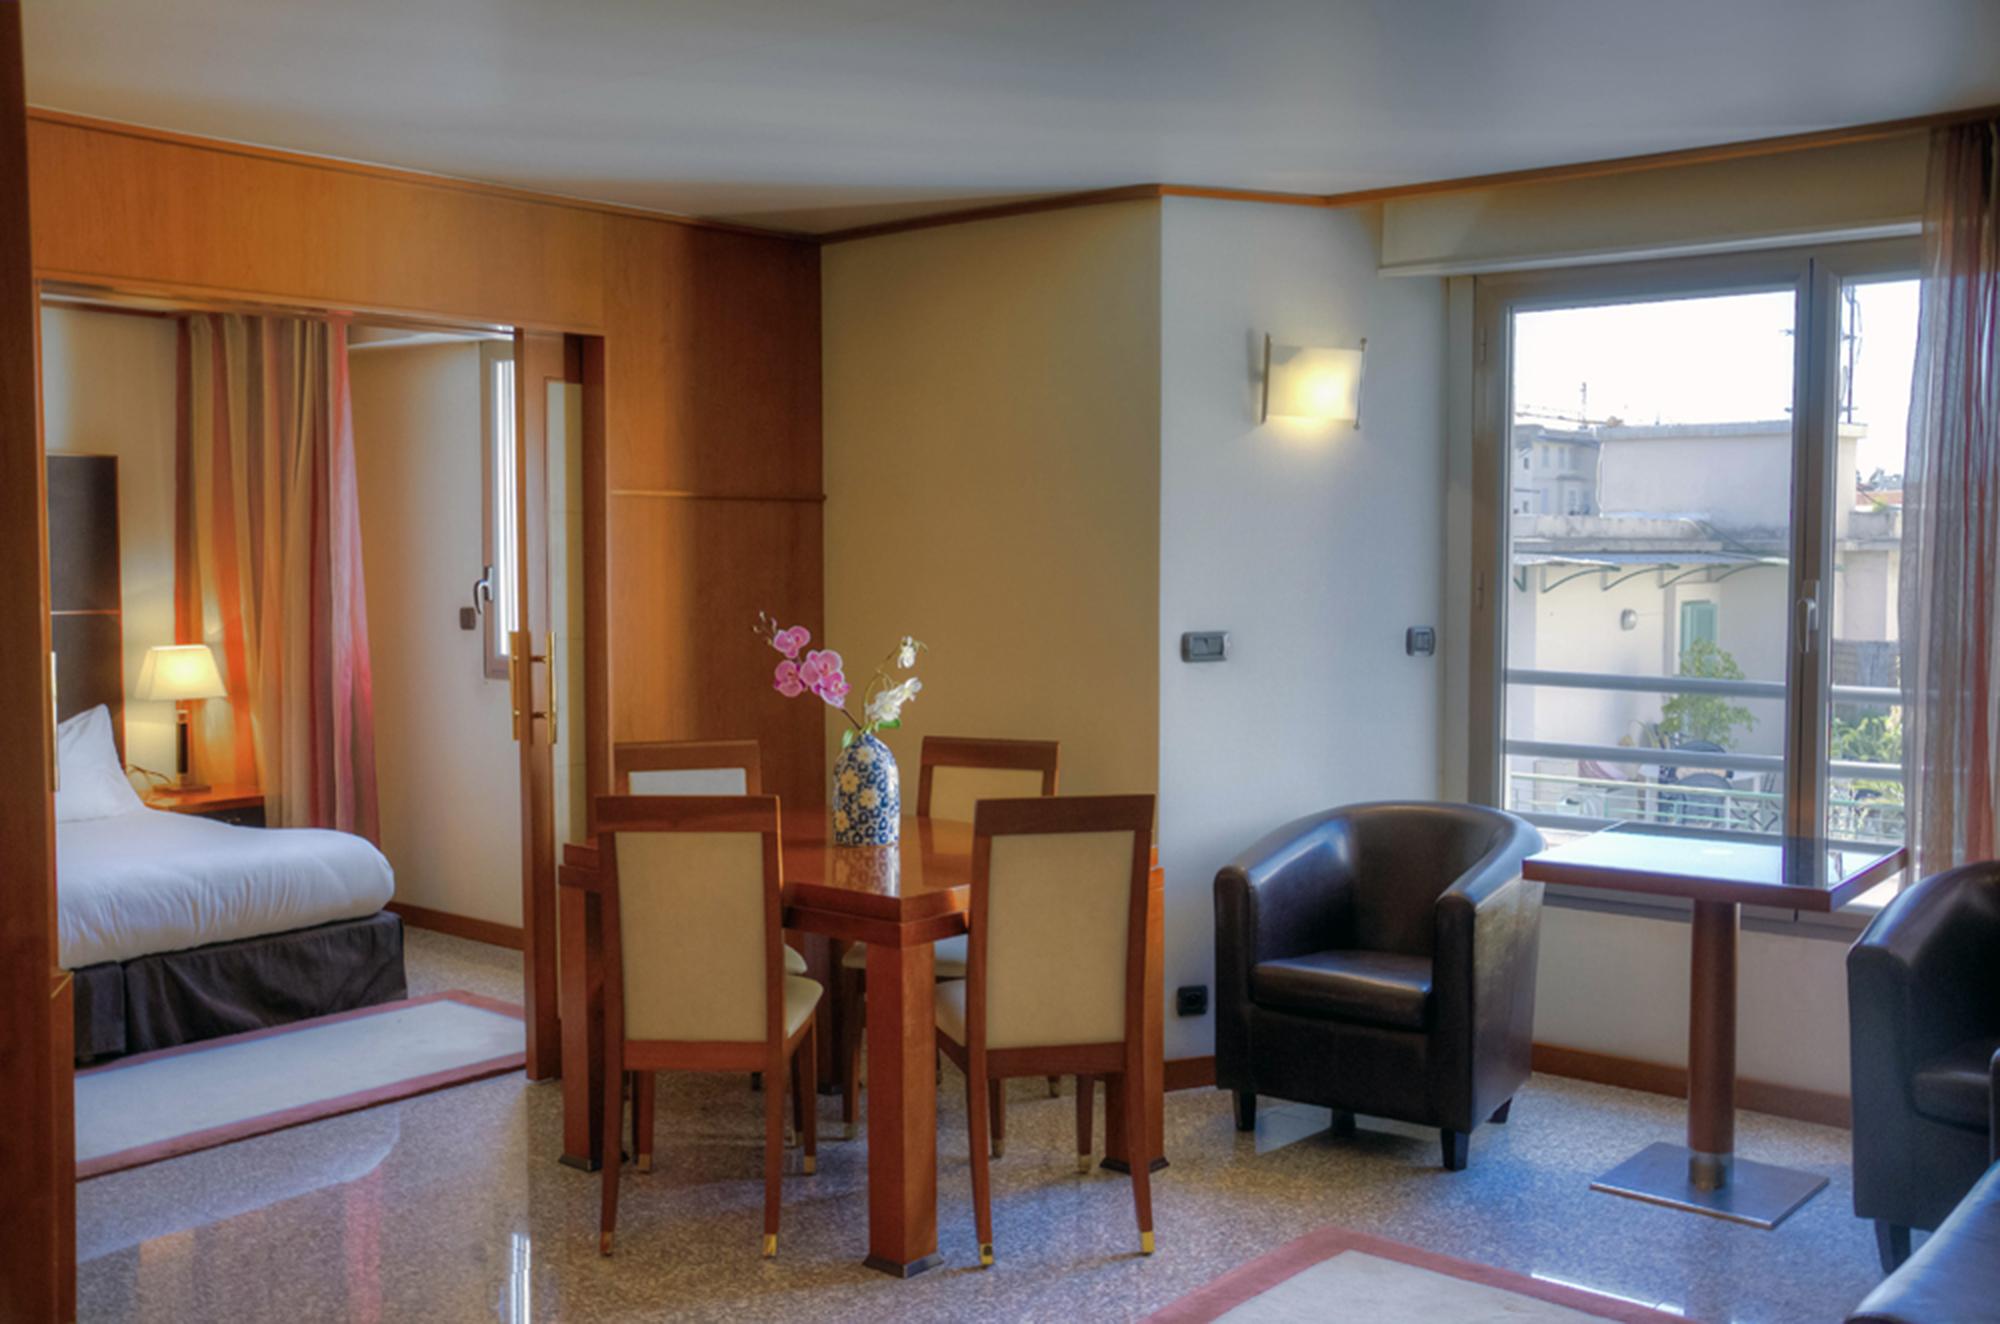 File:Apartment hotel Nice.jpg - Wikimedia Commons